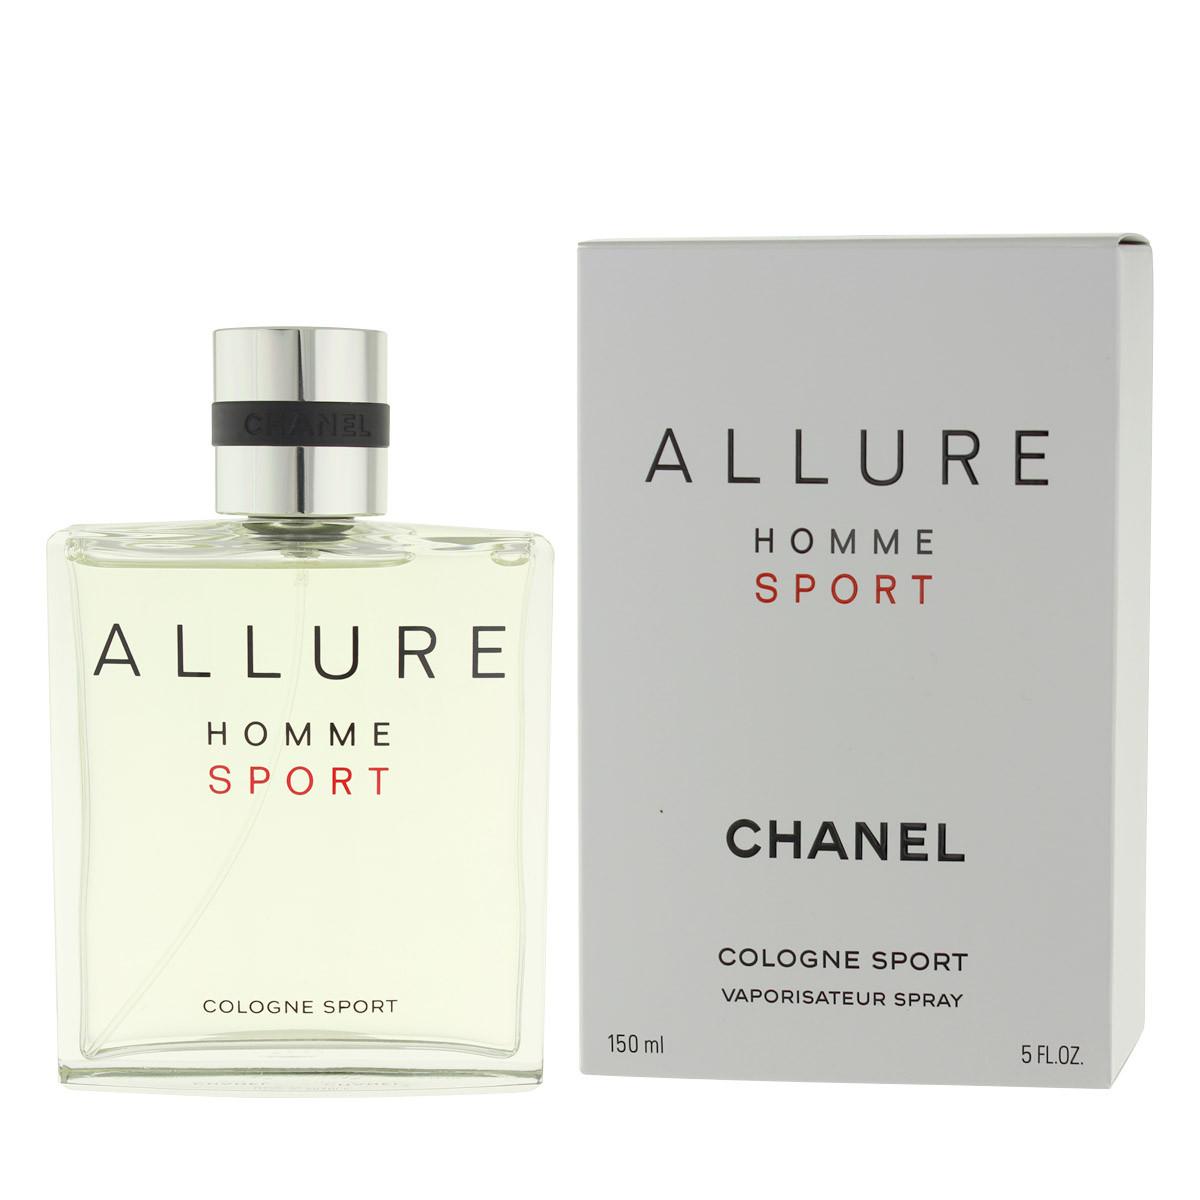 0c6a3c237ec0 Chanel Allure Homme Sport Cologne EDC 150 ml M - Allure Homme Sport ...